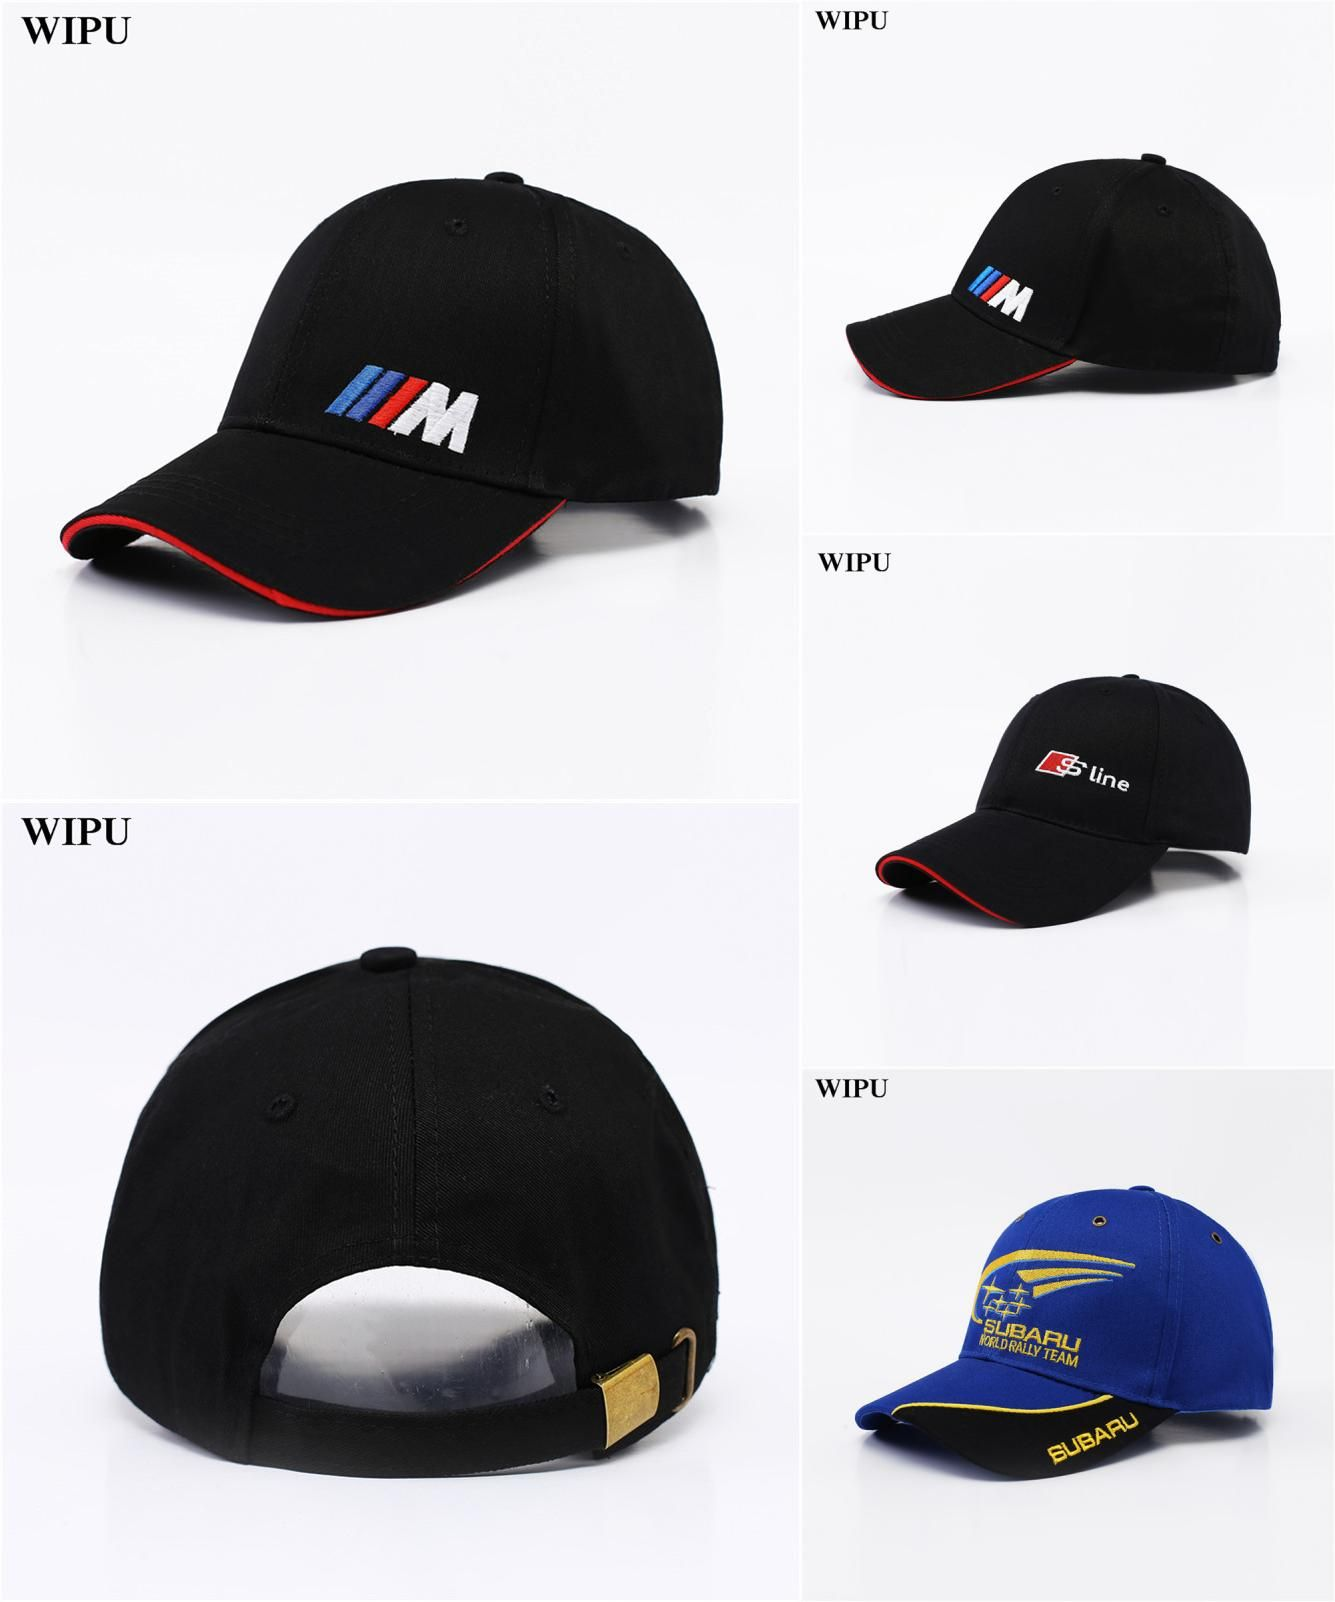 Back To Search Resultsapparel Accessories Men Fashion Cotton Car Logo M Performance Baseball Cap Hat For M3 M5 3 5 7 X1 X3 X4 X5 X6 330i Z4 Gt 760li E30 E34 E36 E38